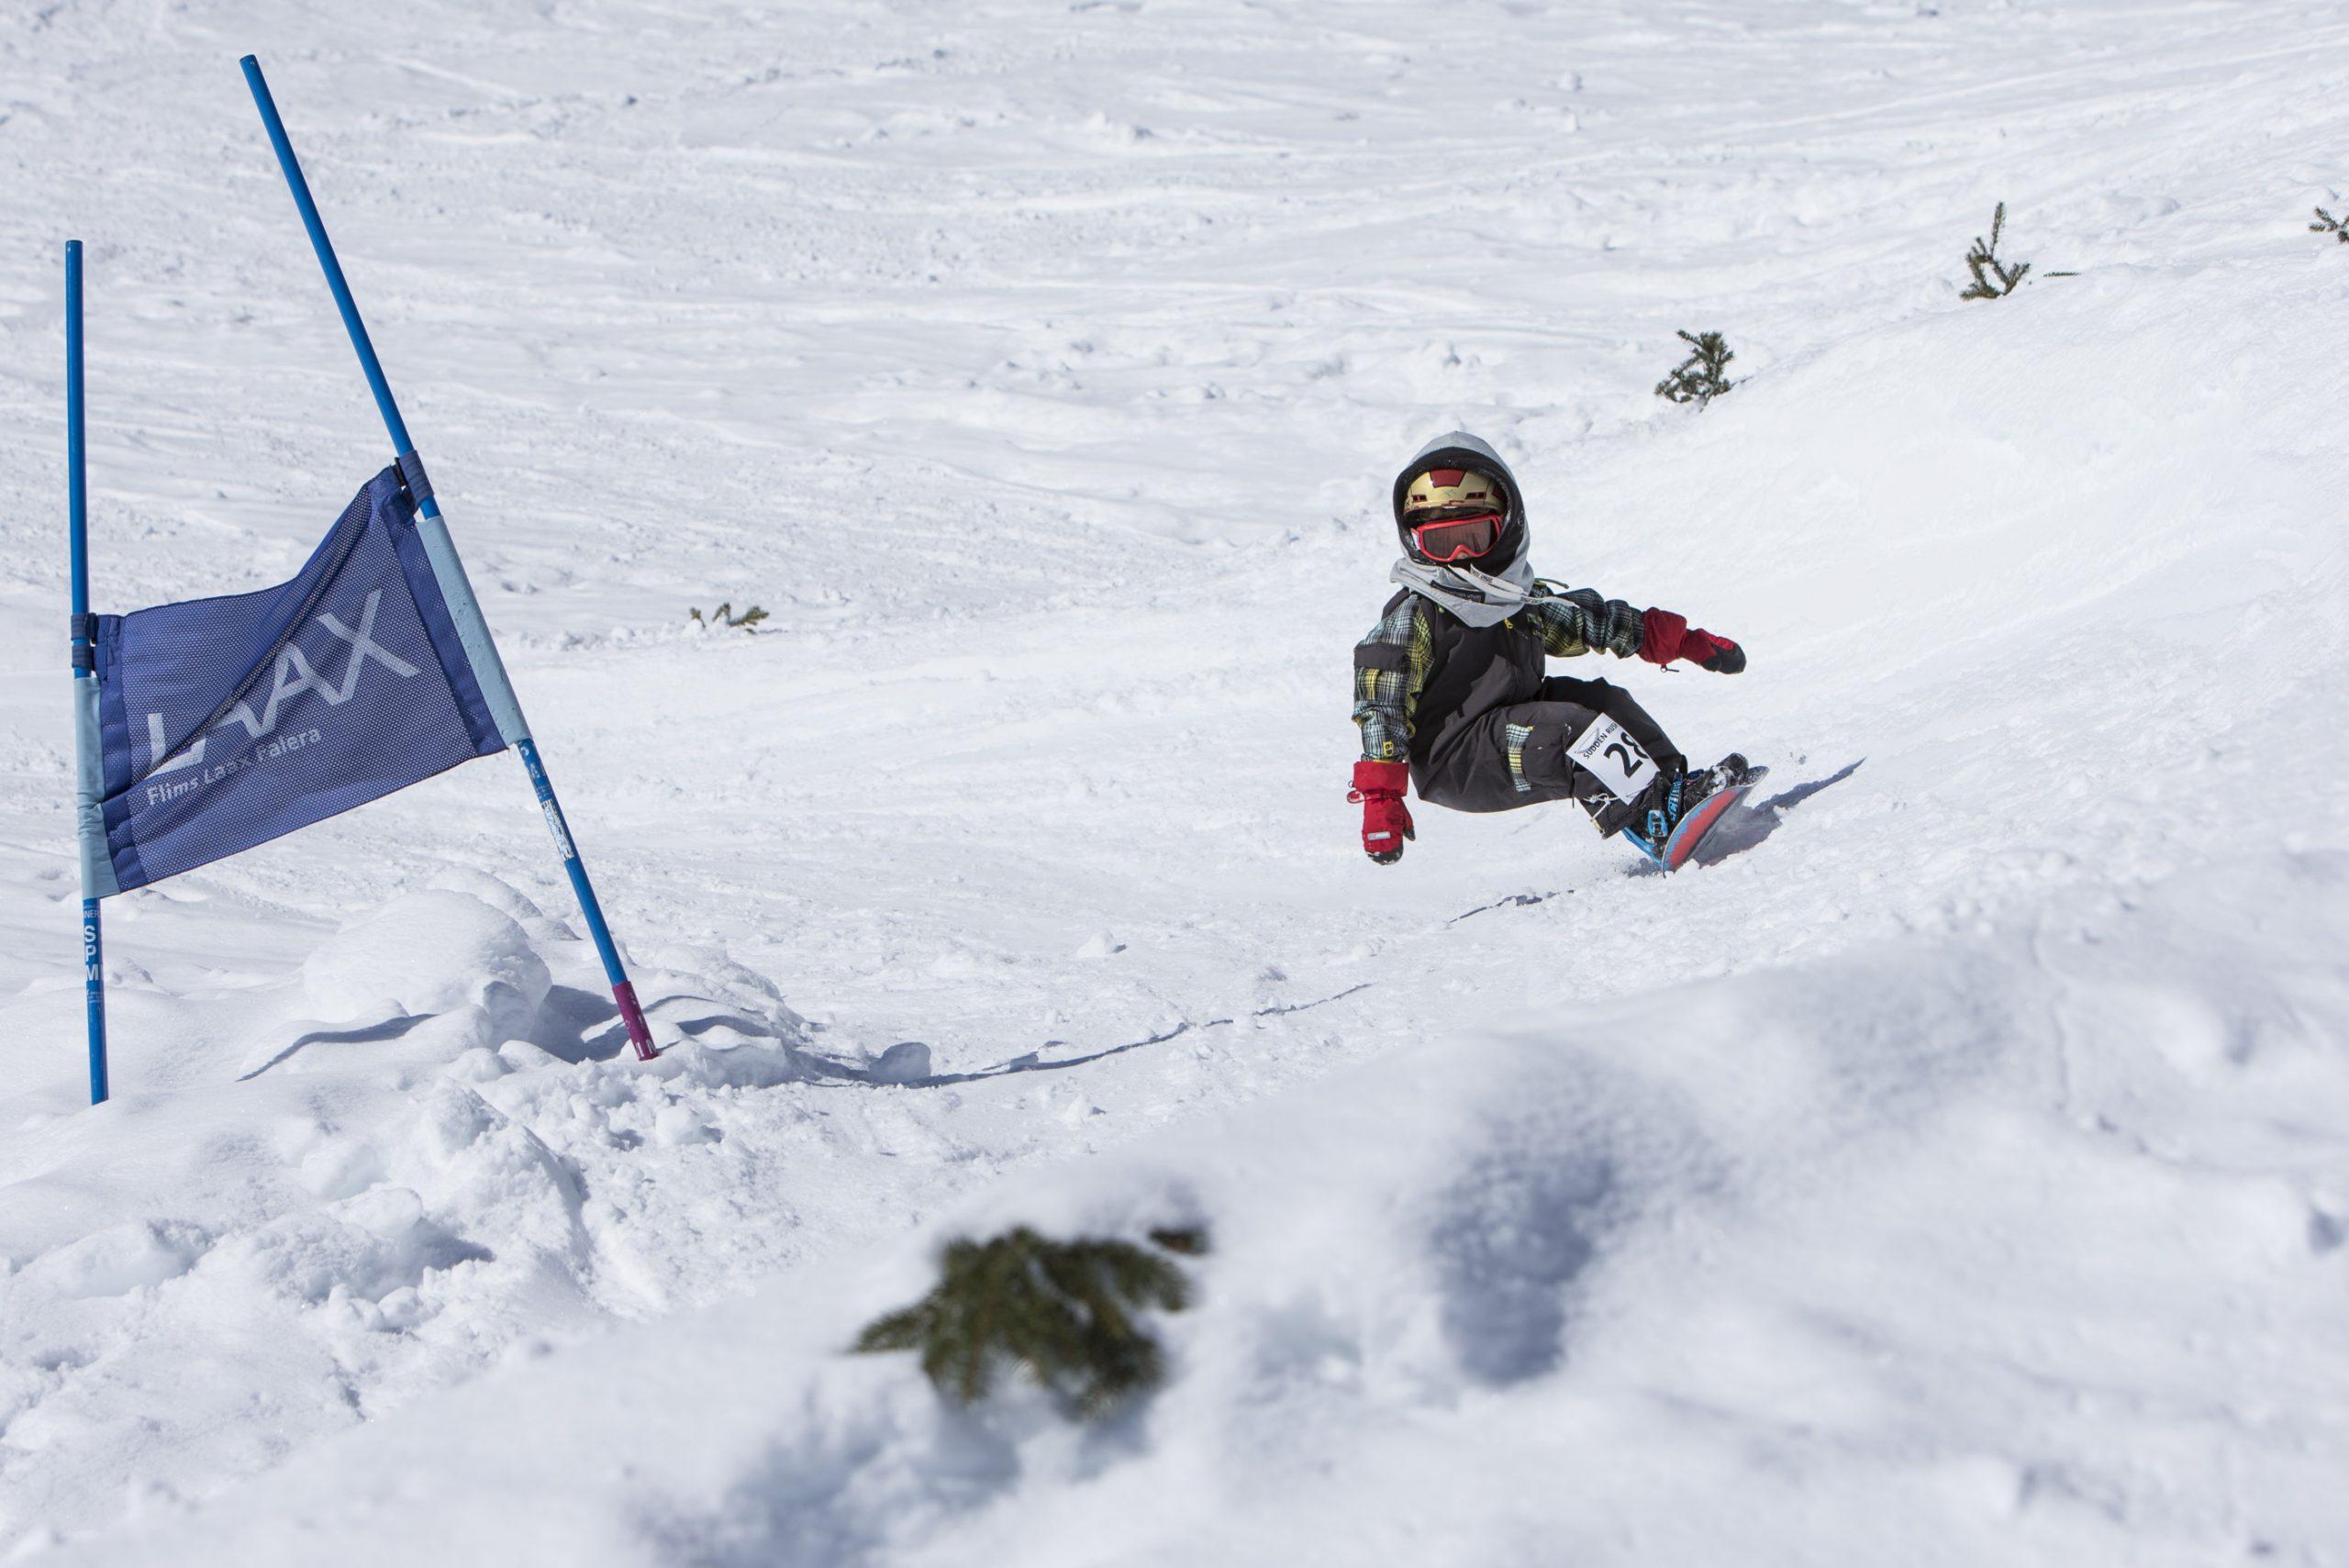 Sudden_Rush_Banked_Slalom_Laax_18_YOUNGEST_Mauro CAPREZ_Ruggli_226